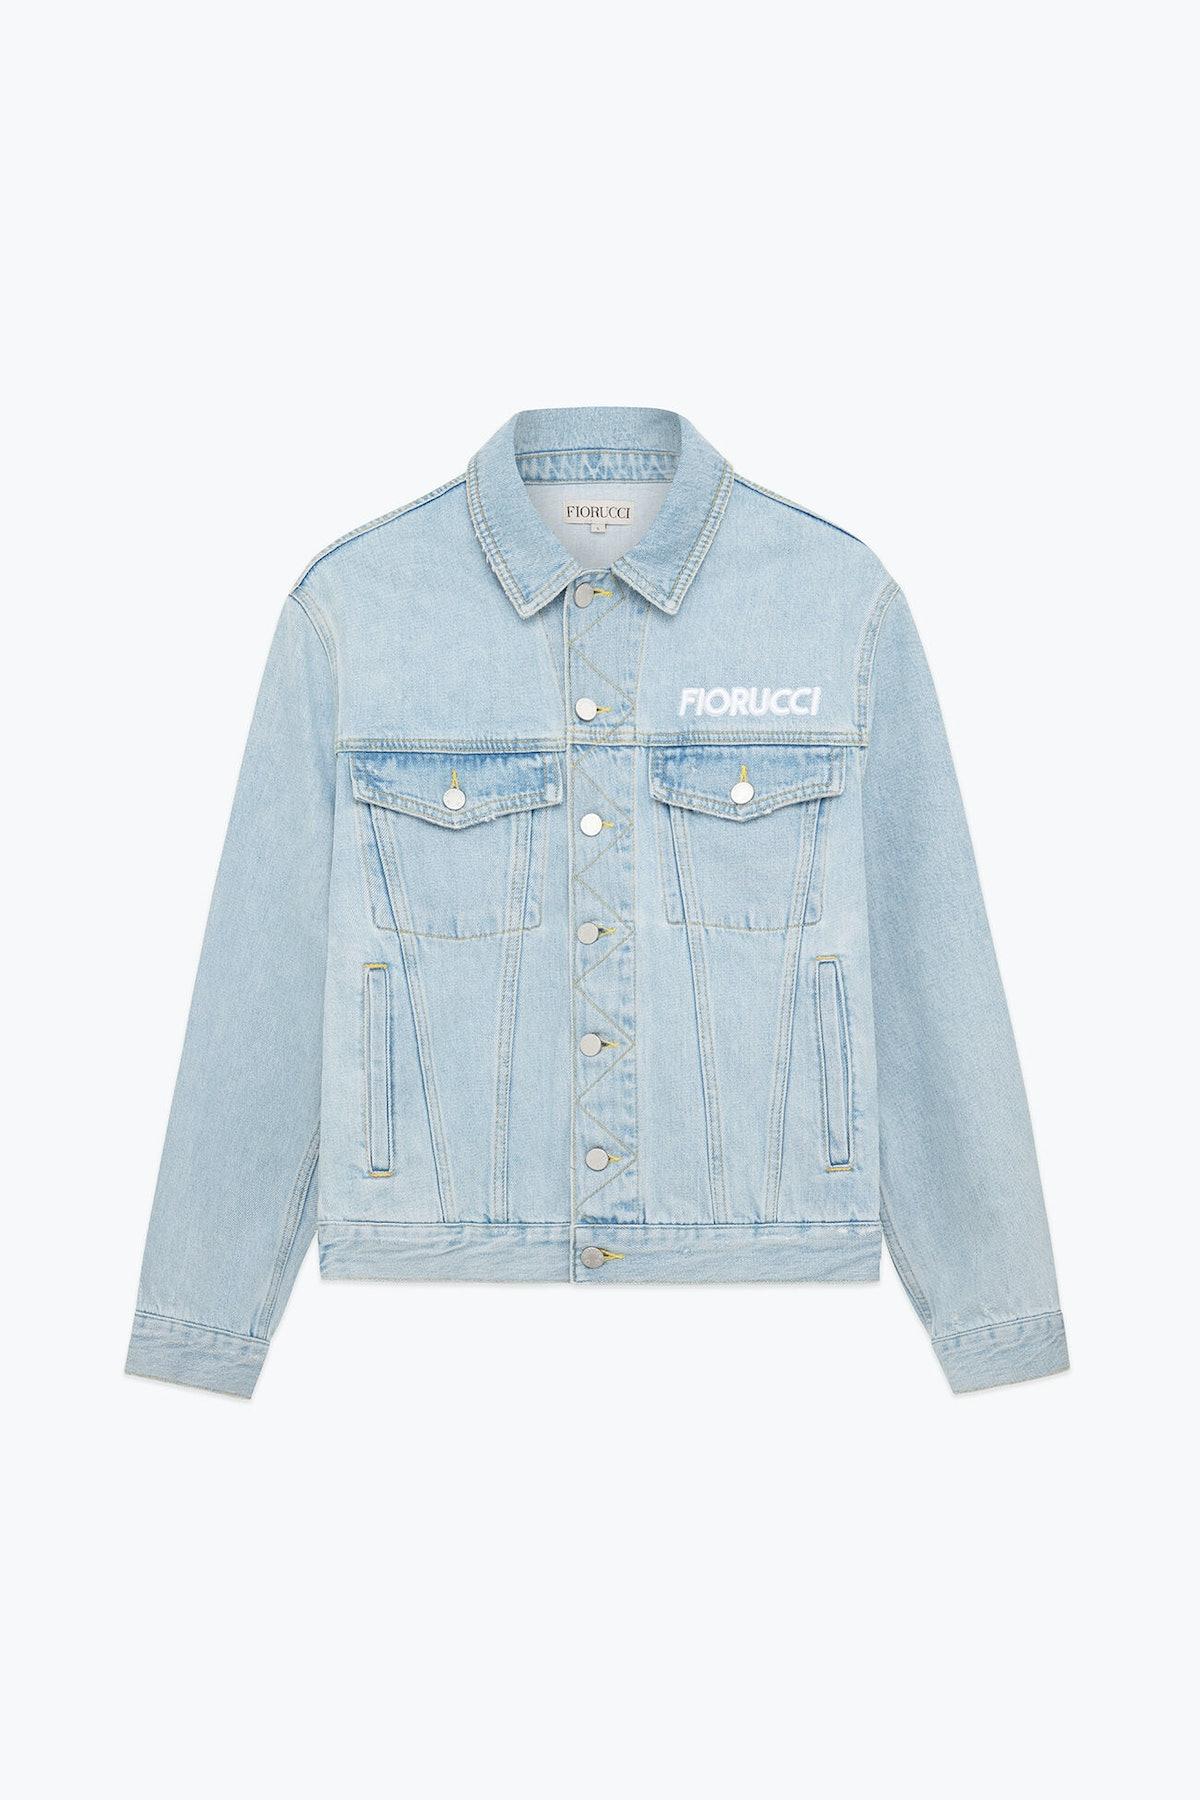 Martini Nico Denim Jacket